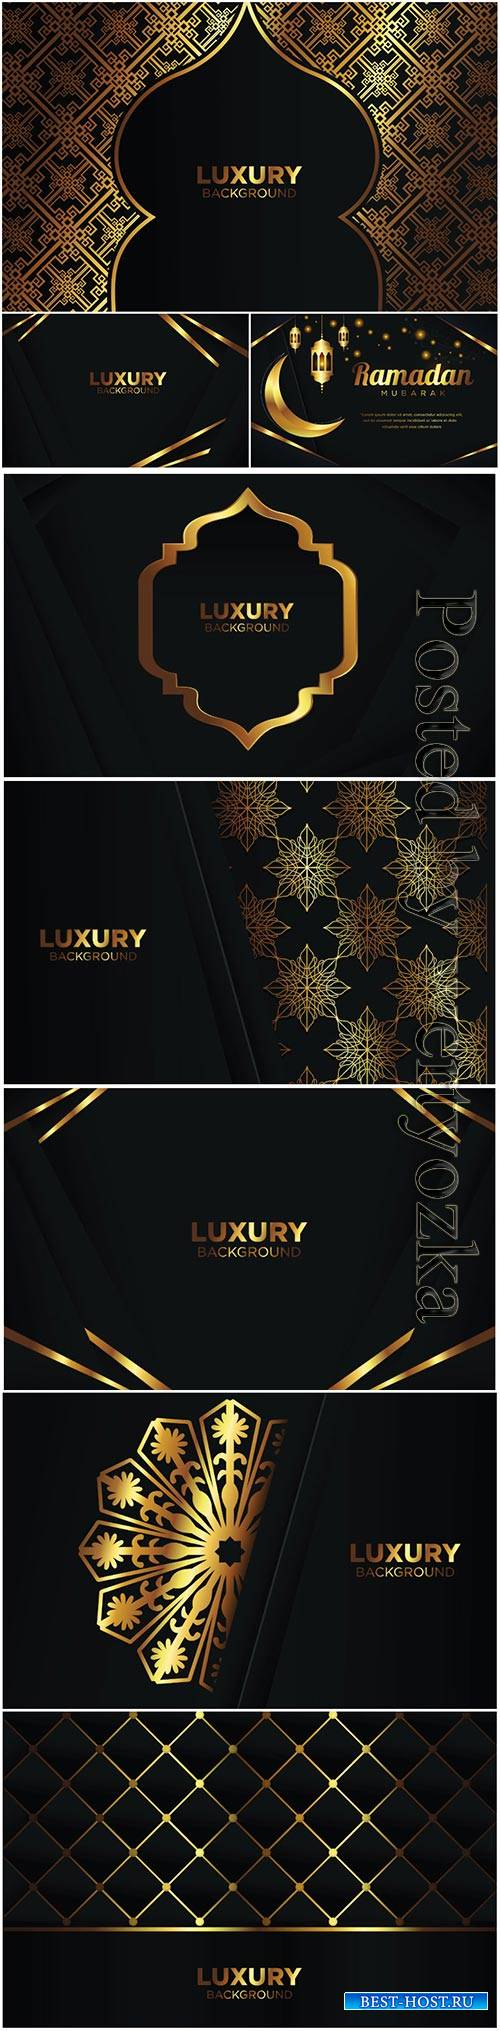 Luxury vector background ramadan islamic arabesque